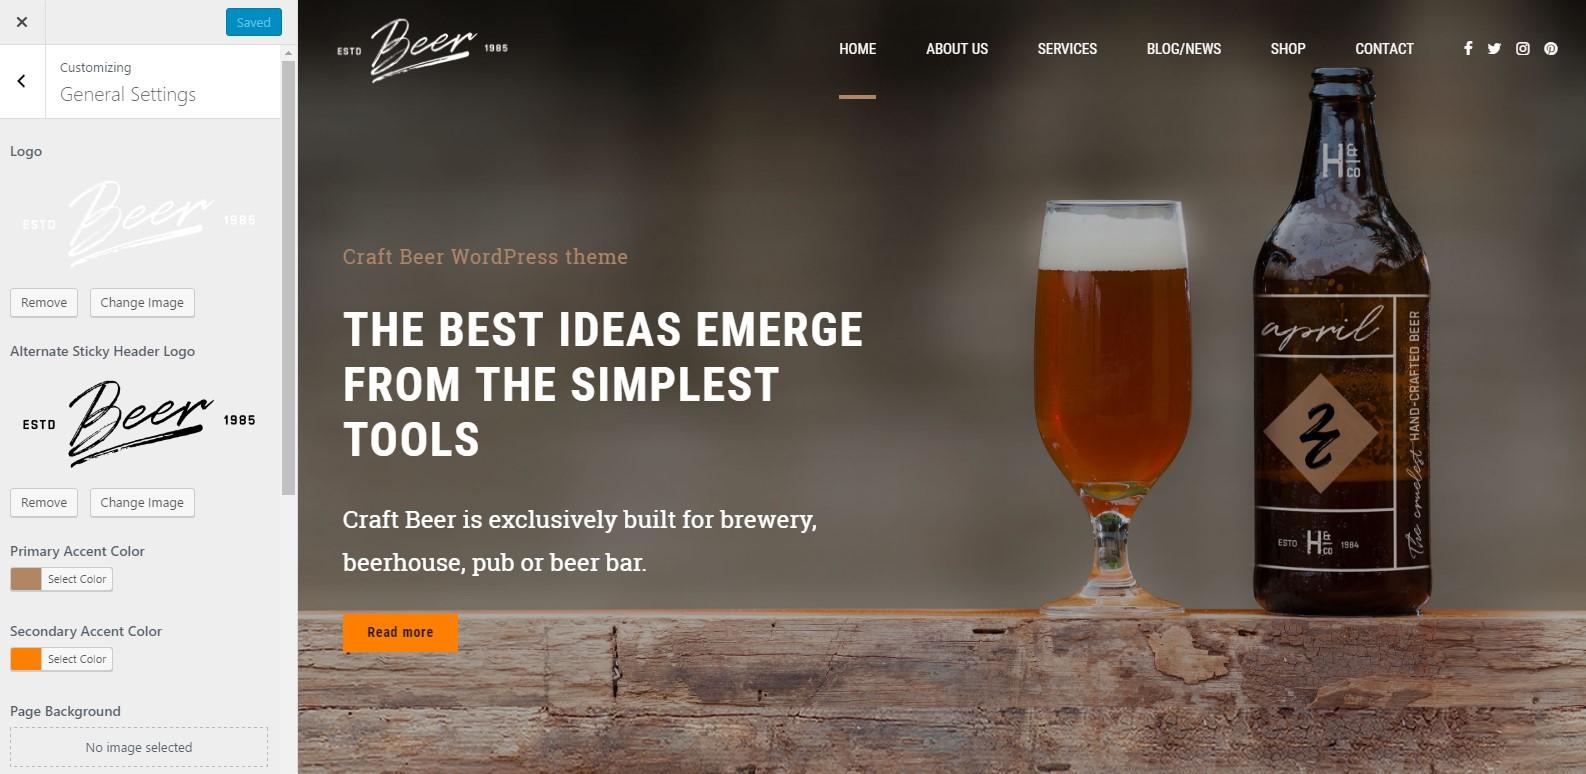 https://documentation.bold-themes.com/craft-beer/wp-content/uploads/sites/17/2016/07/alternate-color.jpg